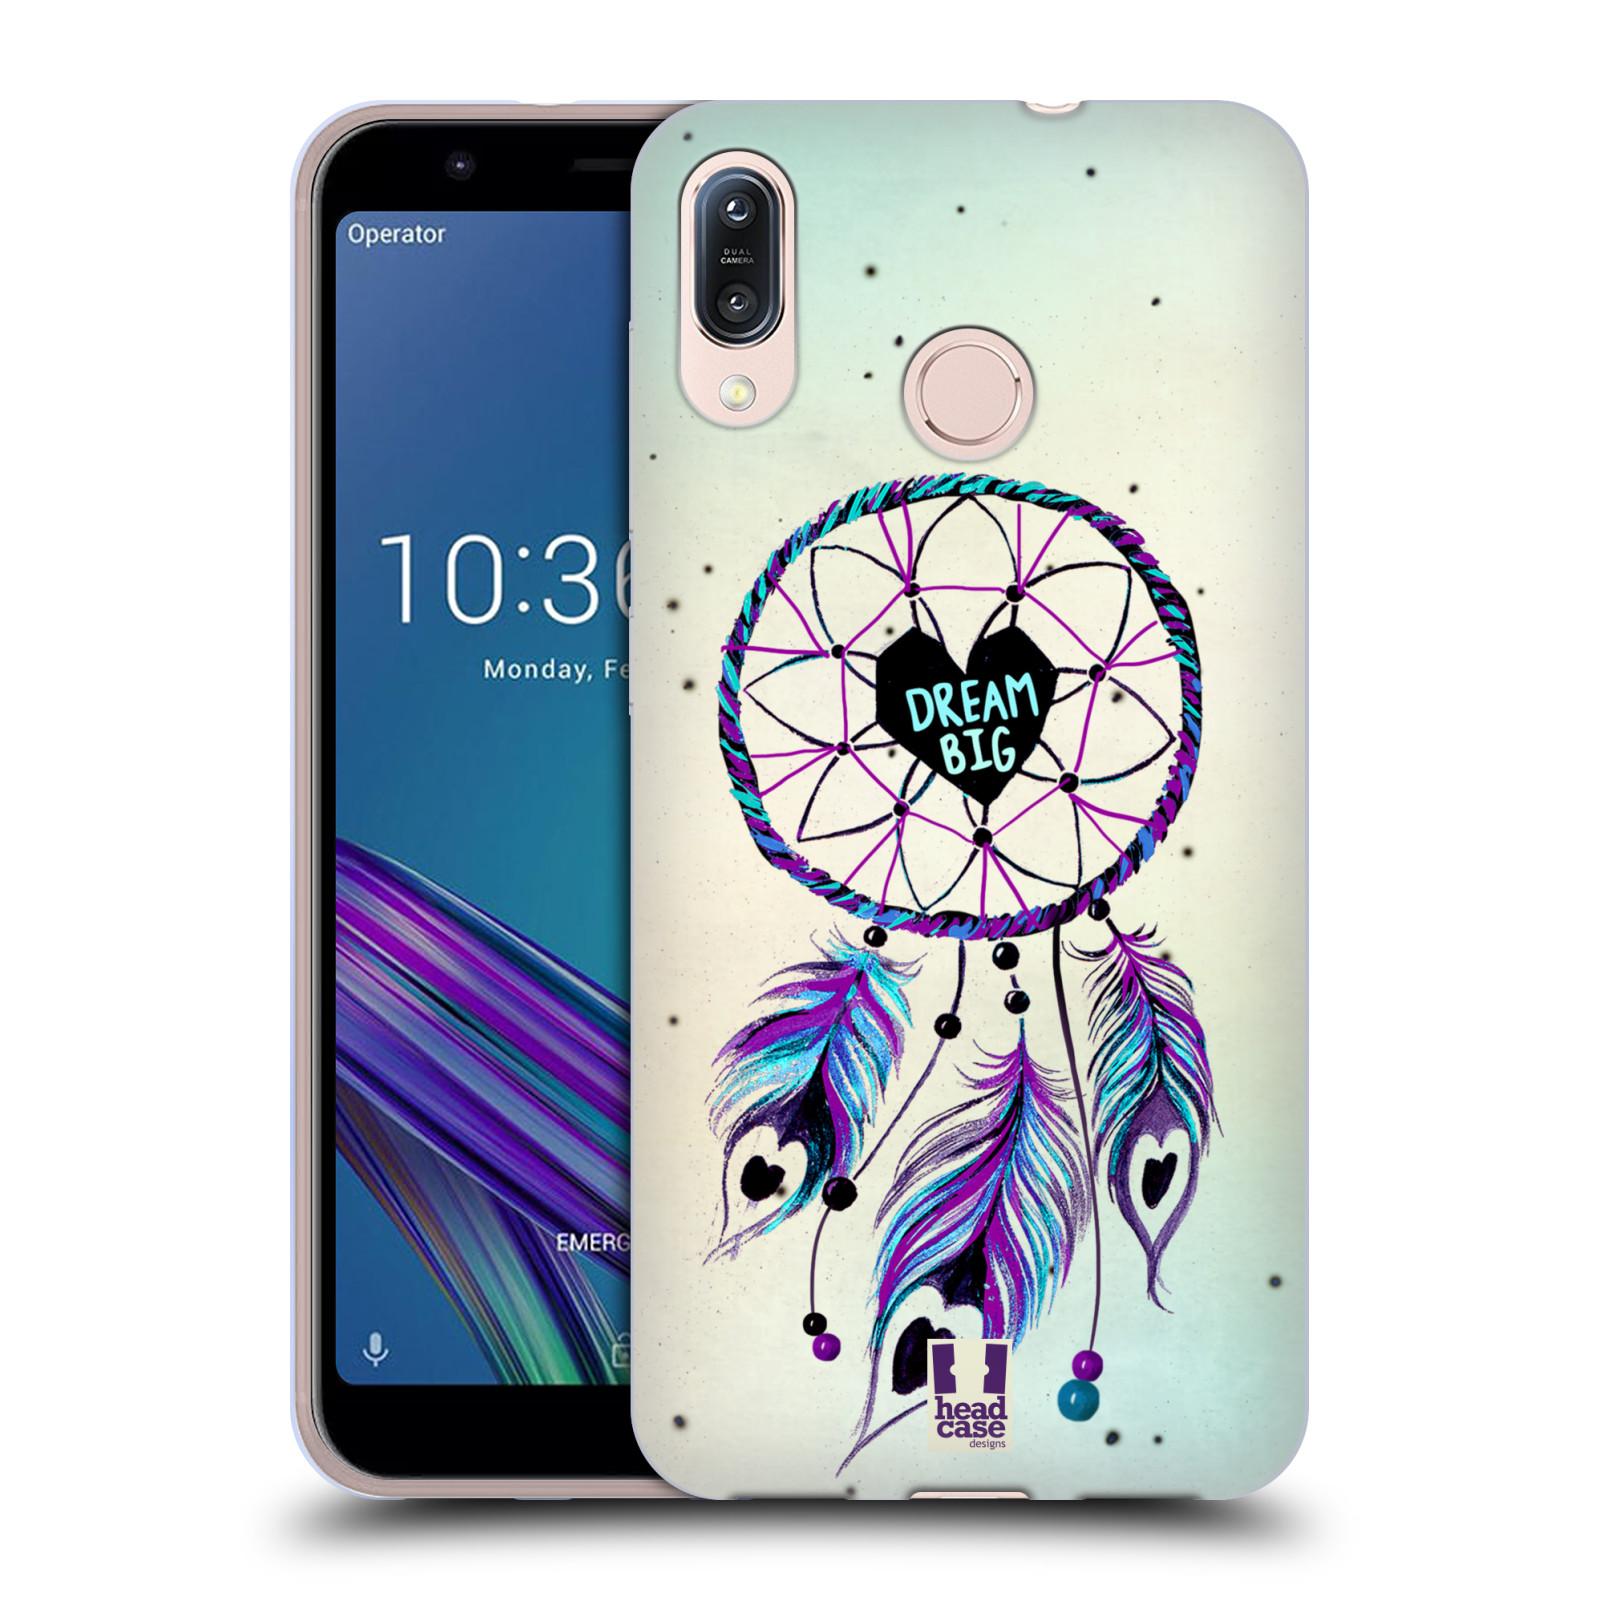 Silikonové pouzdro na mobil Asus Zenfone Max M1 ZB555KL - Head Case - Lapač Assorted Dream Big Srdce